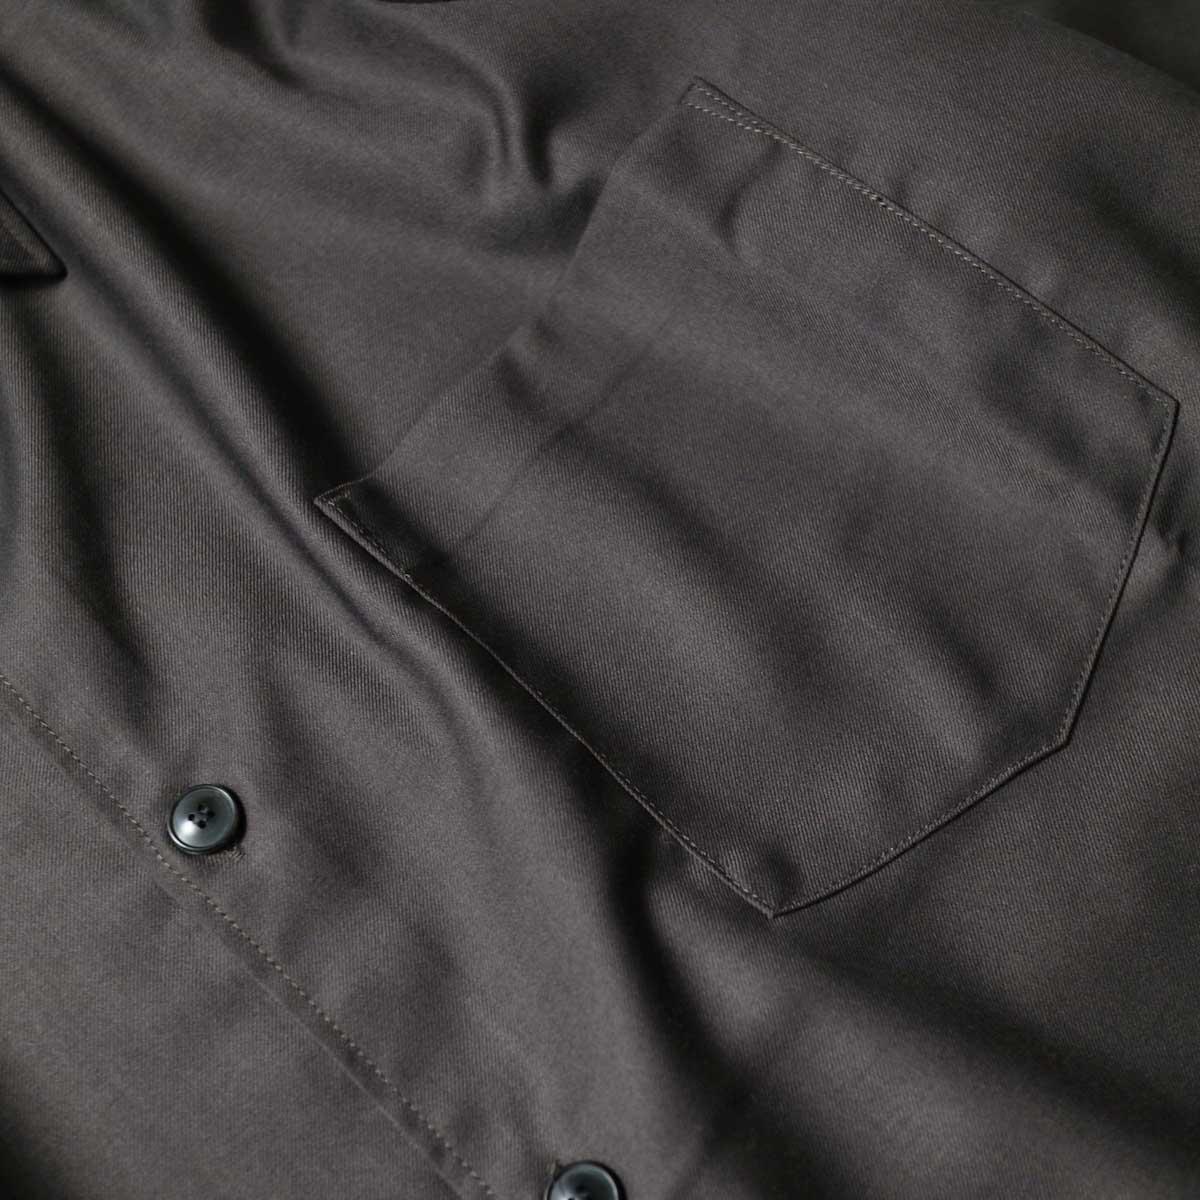 alvana / Wrinkle Proof Wide Shirts (Charcoal)ポケット